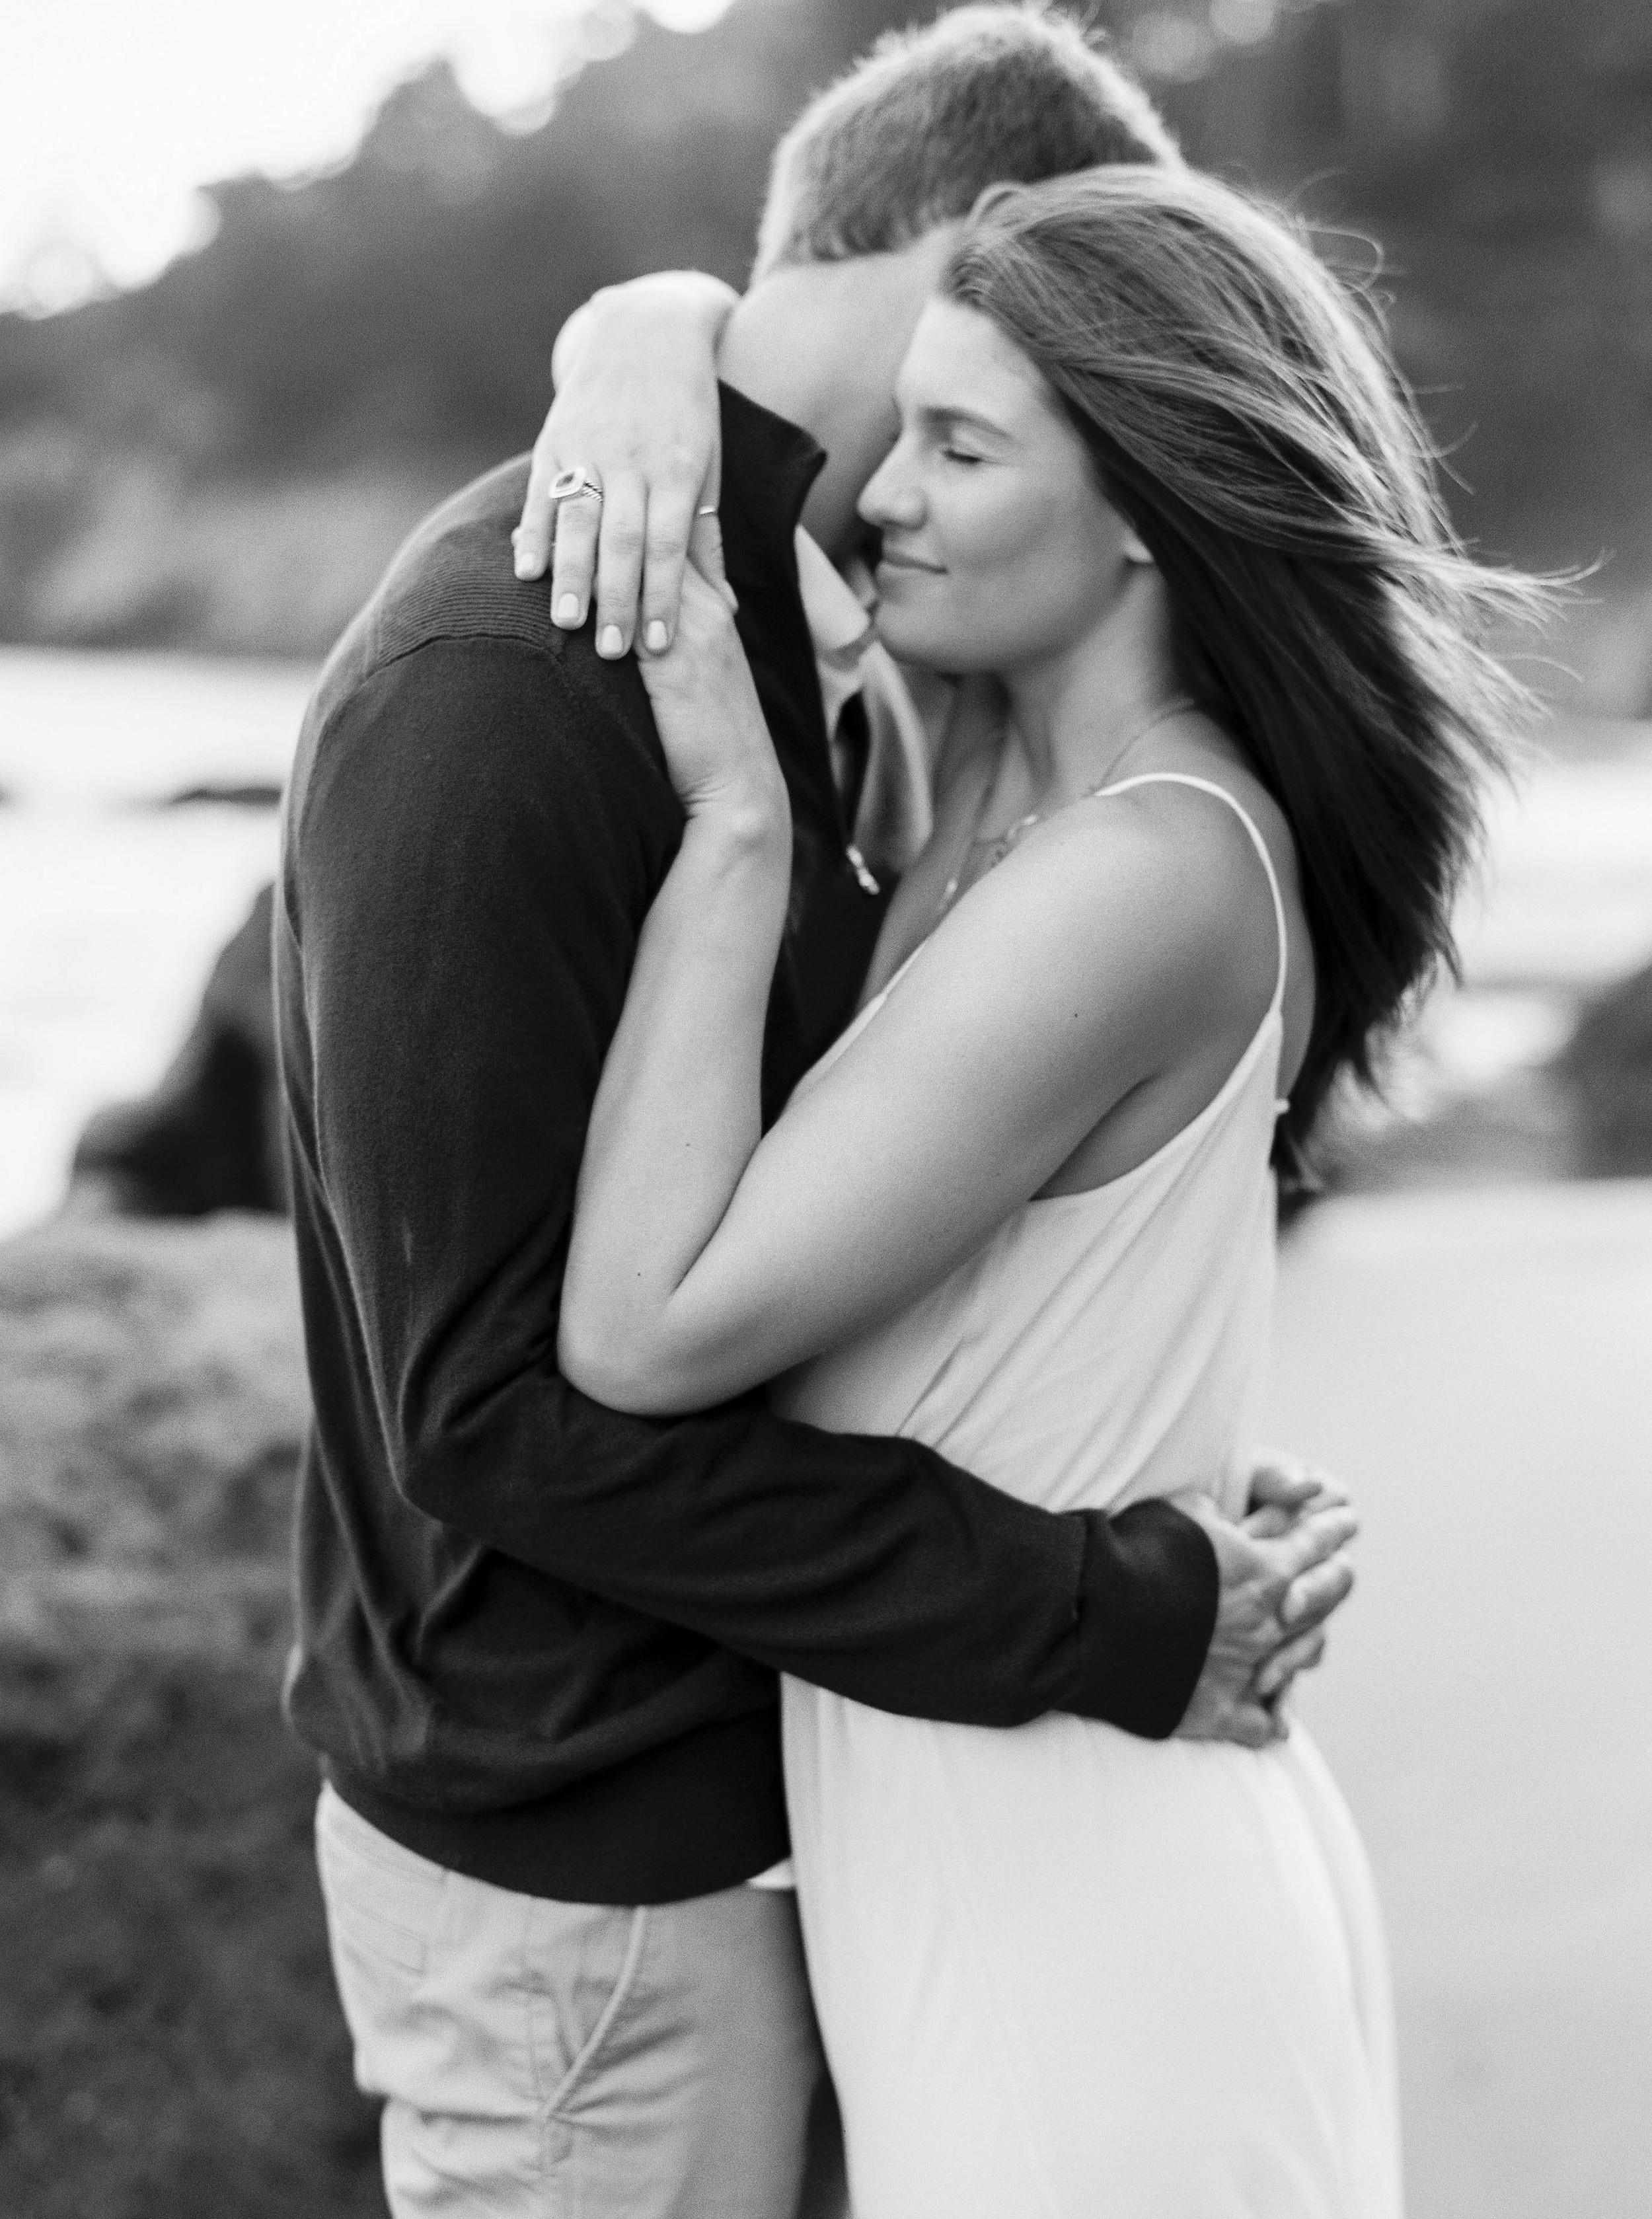 Meghan Mehan Photography - Fine Art Film Wedding Photography - San Francisco | Napa | Sonoma | Big Sur | Santa Barbara - 075.jpg